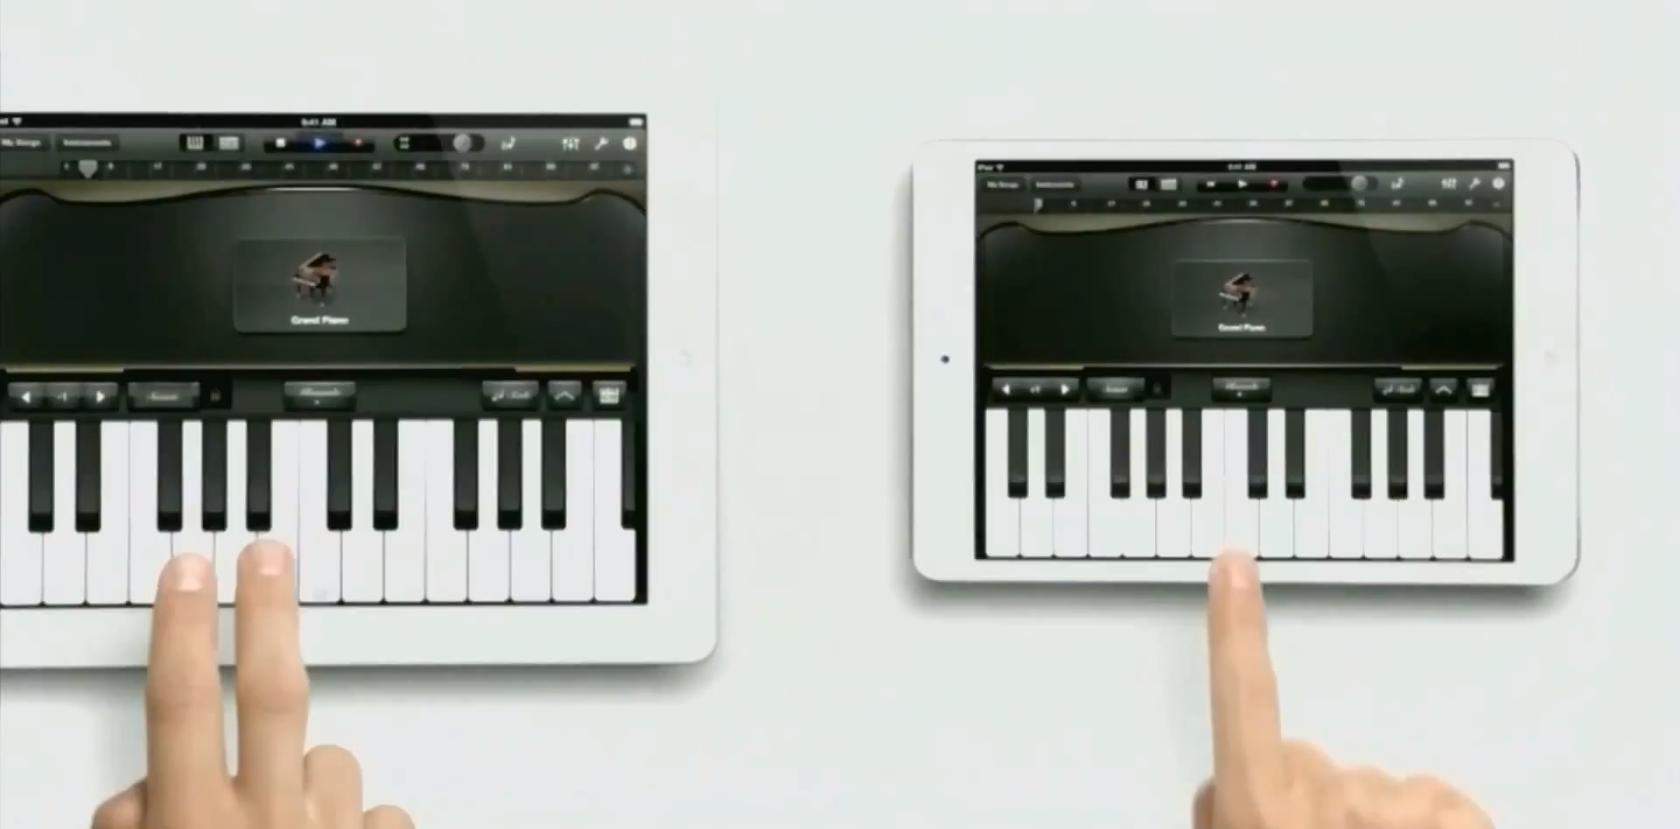 [Video] Conan O'Briens Parodie zum aktuellen iPad mini-Werbespot